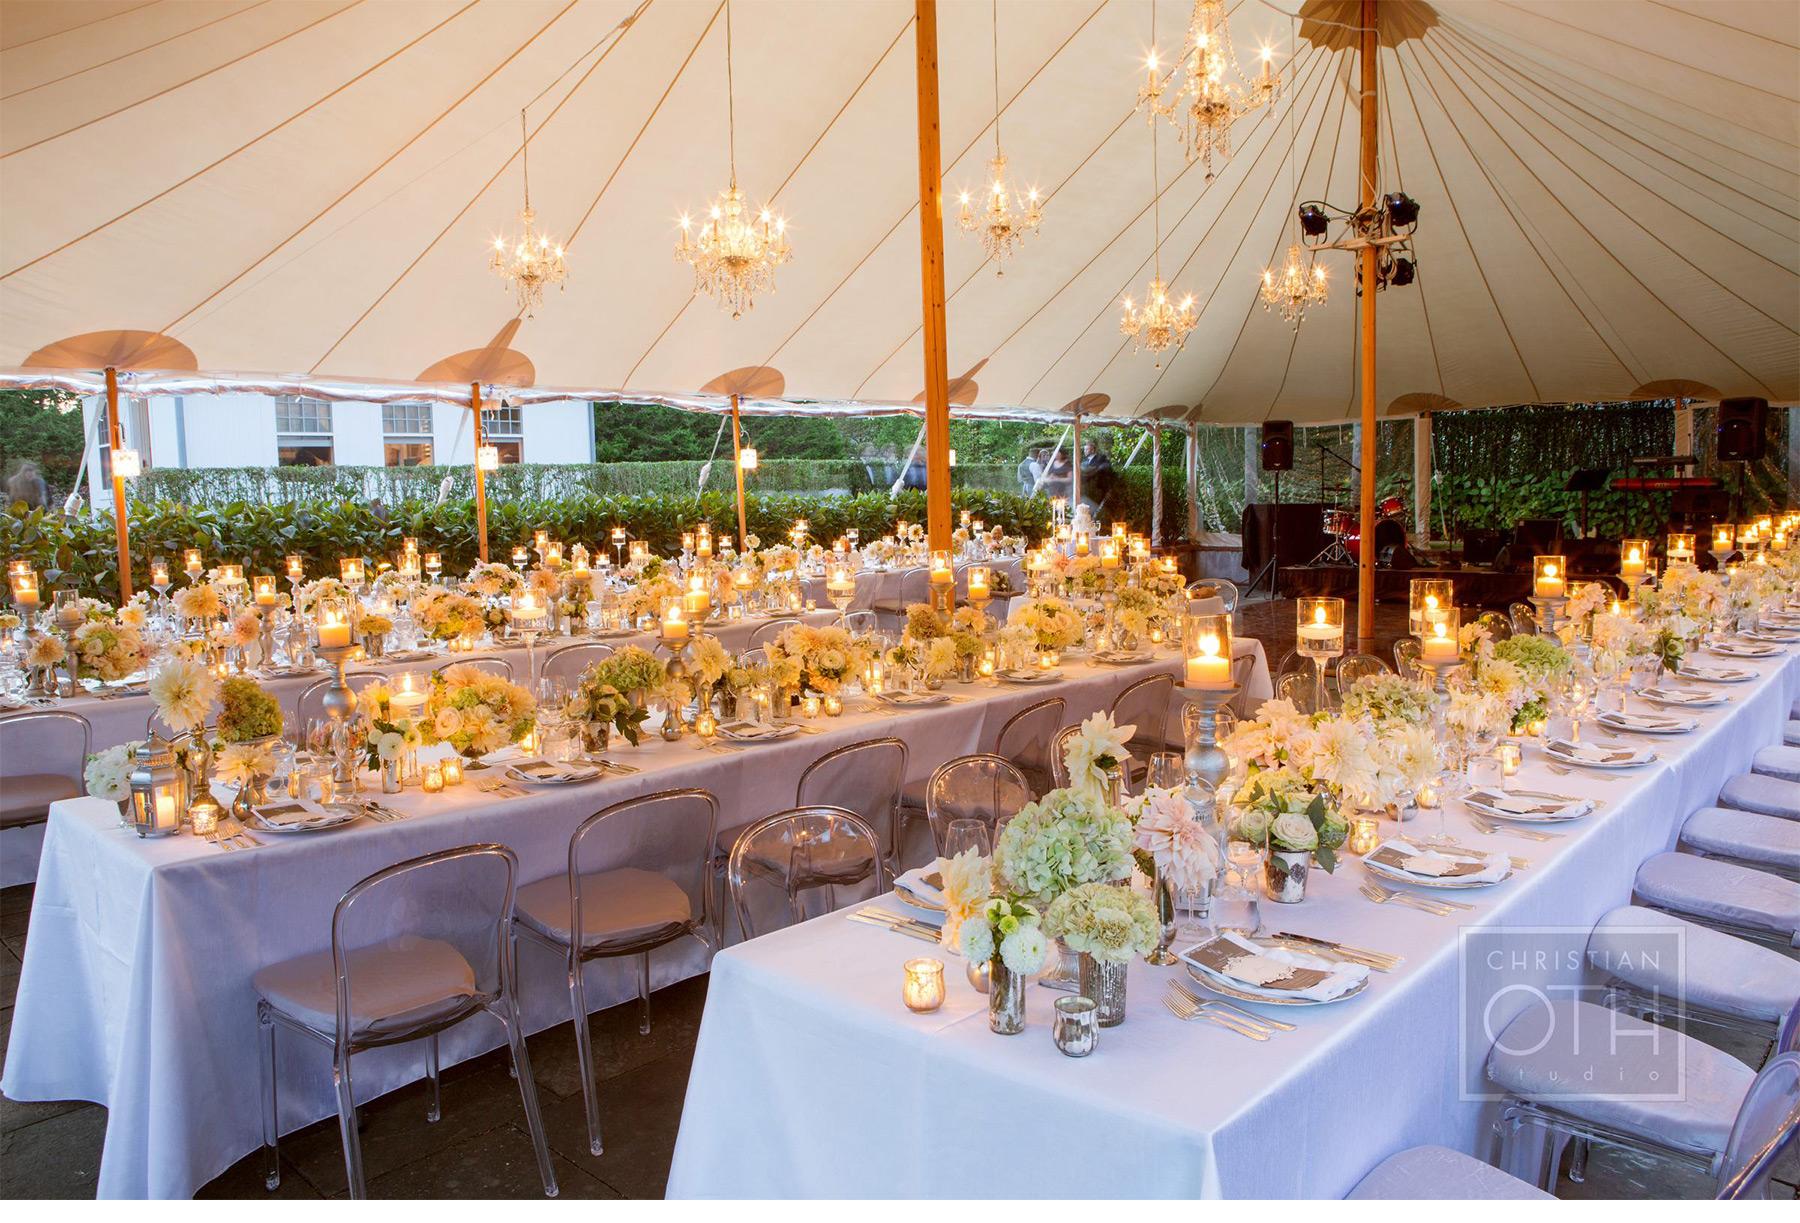 luxury_wedding_windmill_hamptons_chic_lyndsey_hamilton_events_new_york_v243_om_4h.jpg